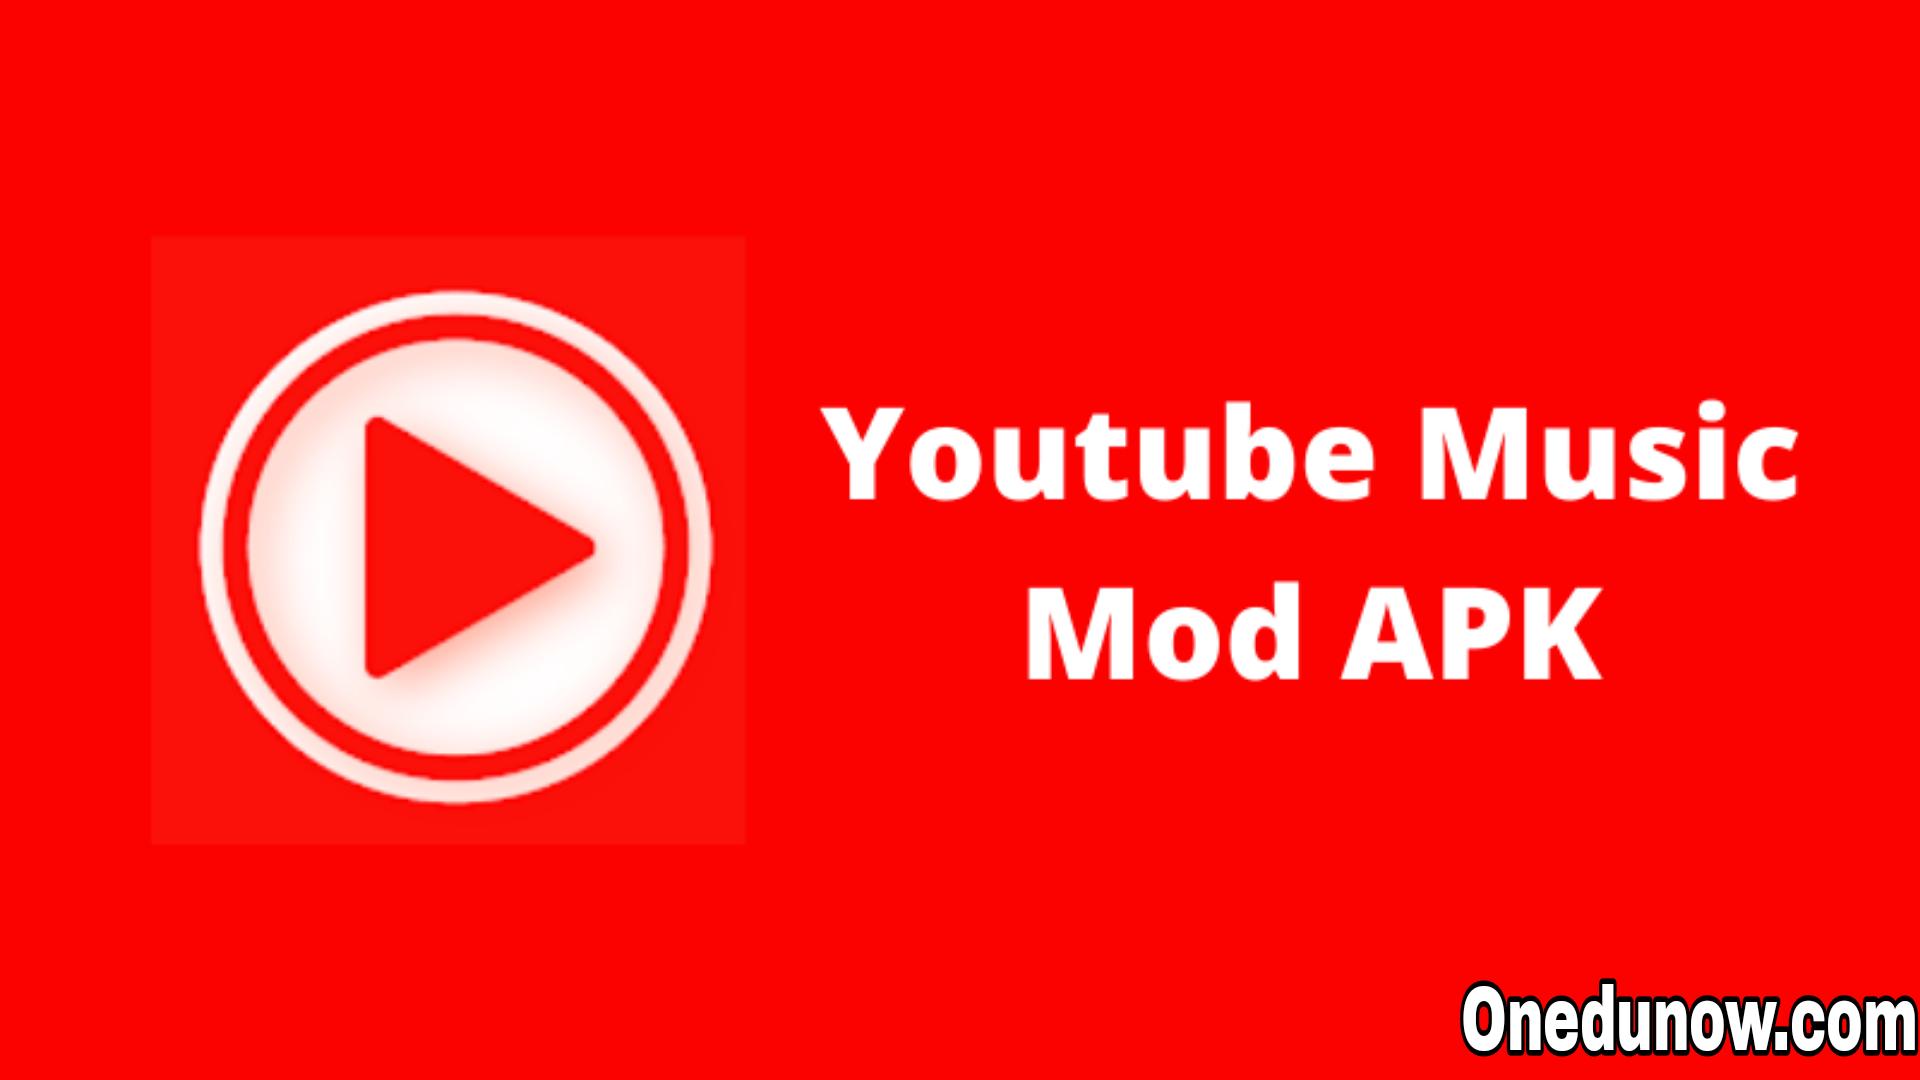 YouTube Music MOD APK v4.49.51 (Premium Unlocked) Download